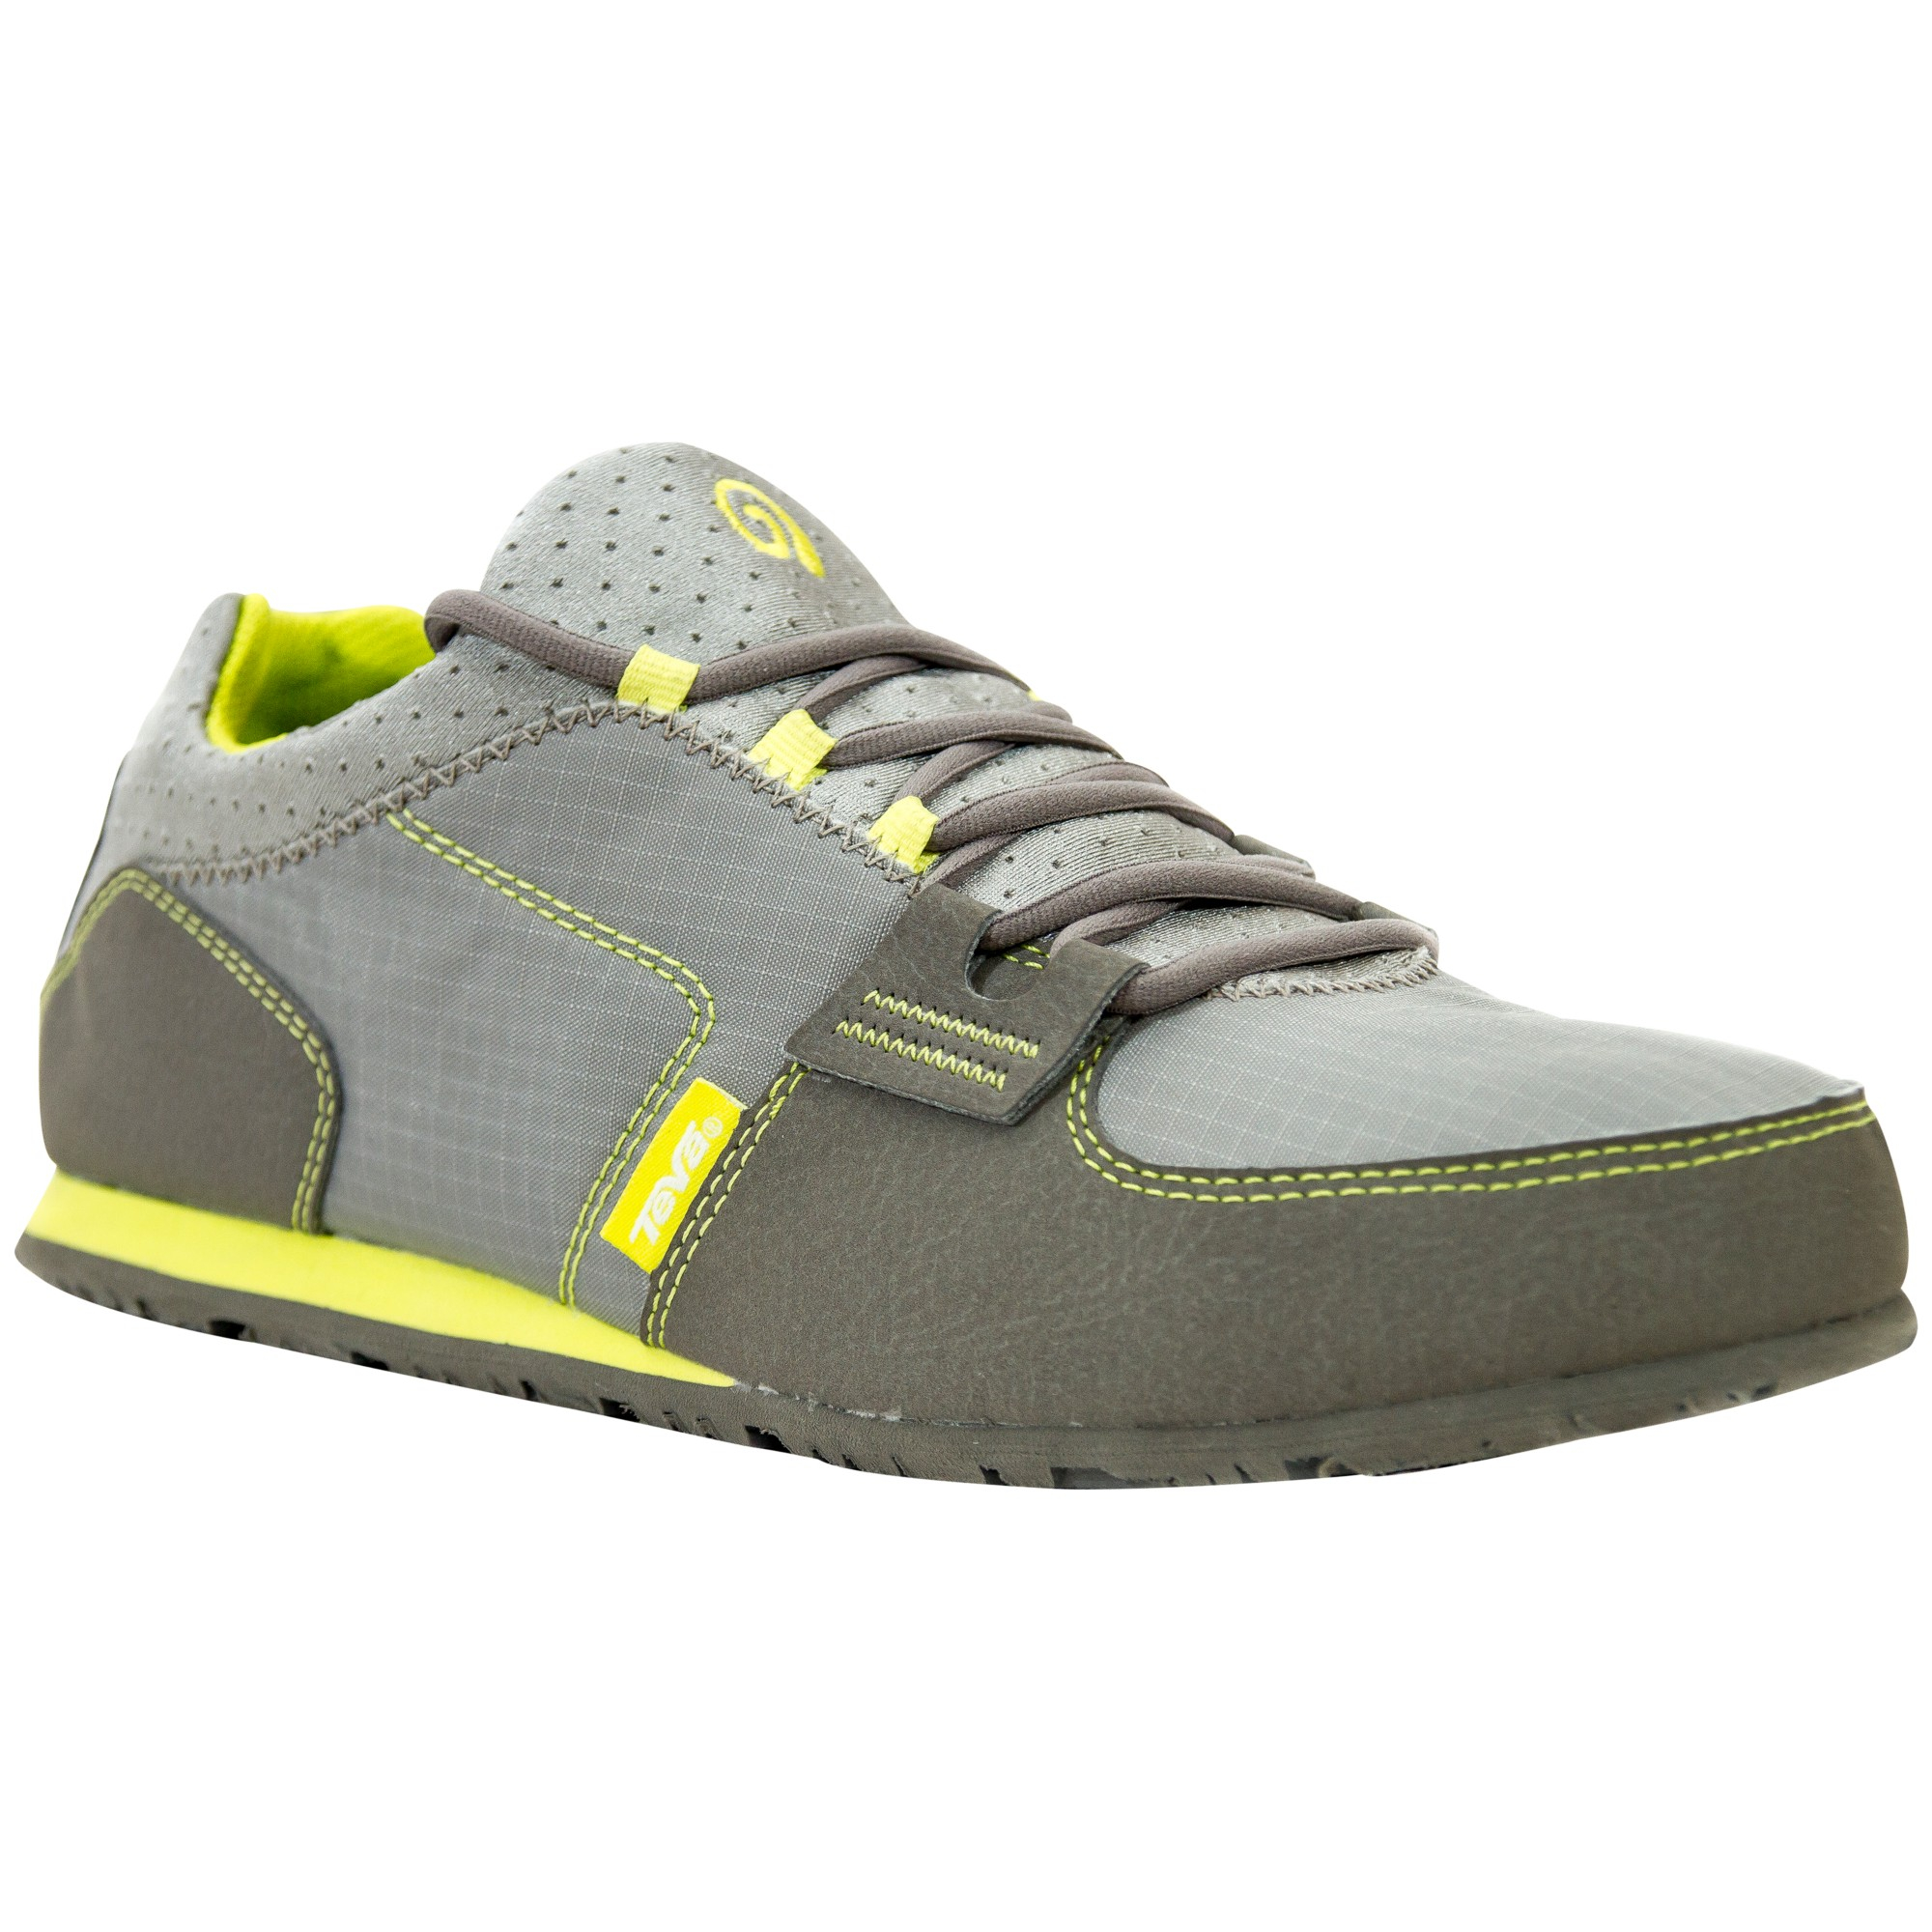 4cf51e49b8df Teva Mens Mush Frio Canvas Shoes in Green for Men - Lyst